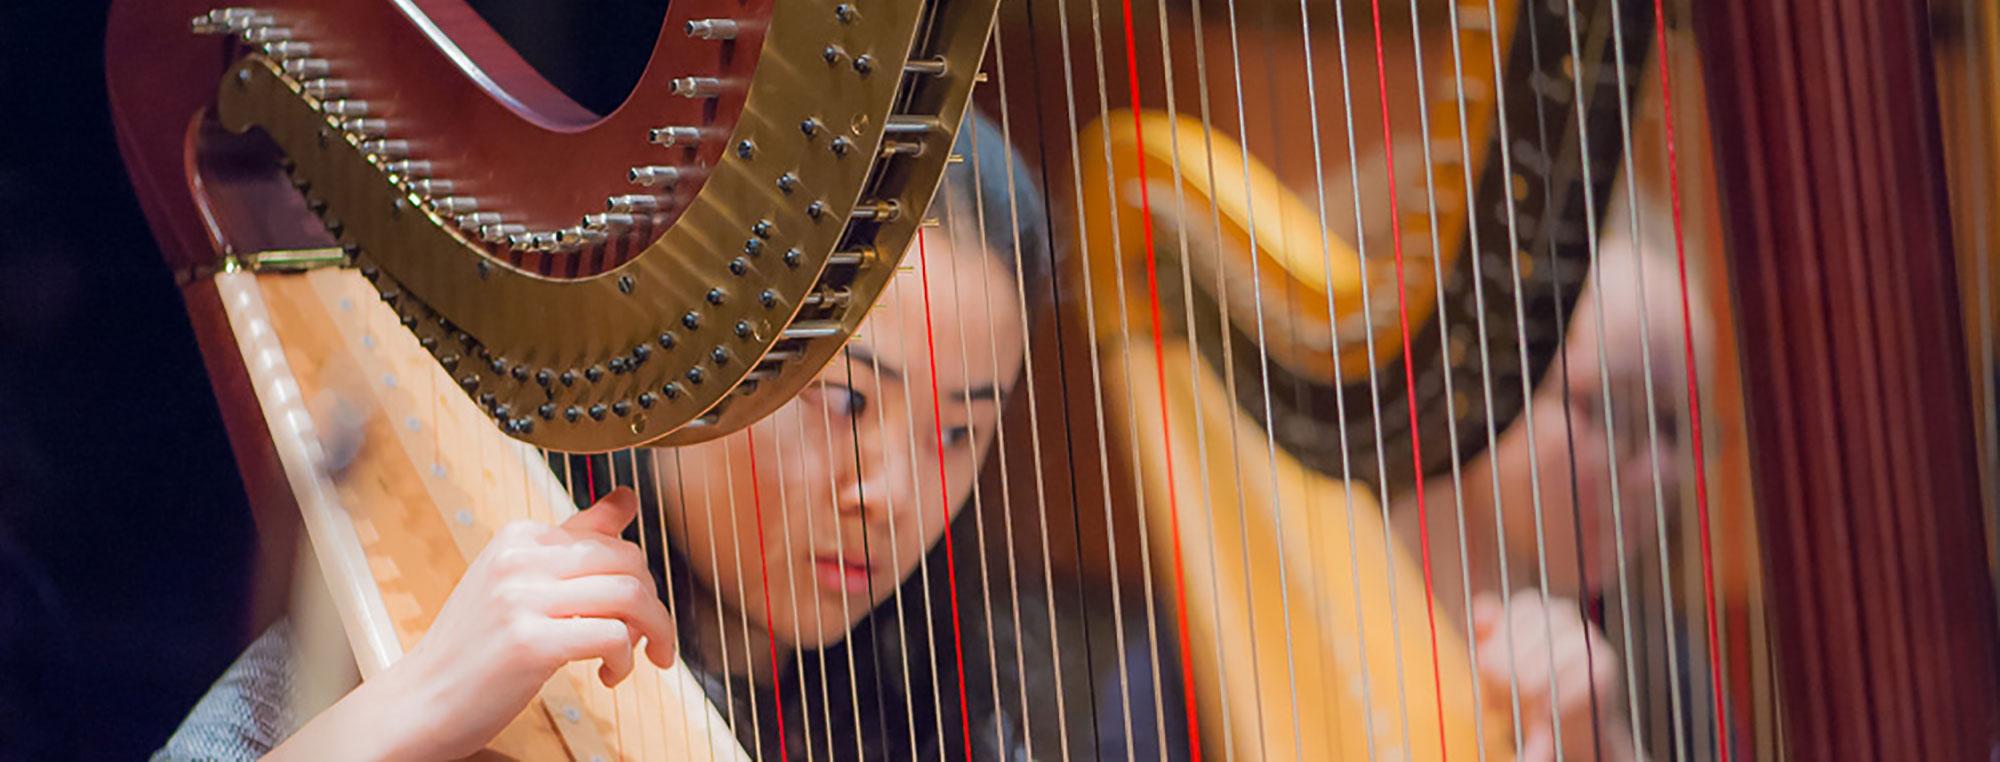 Young Girl Playing Harp